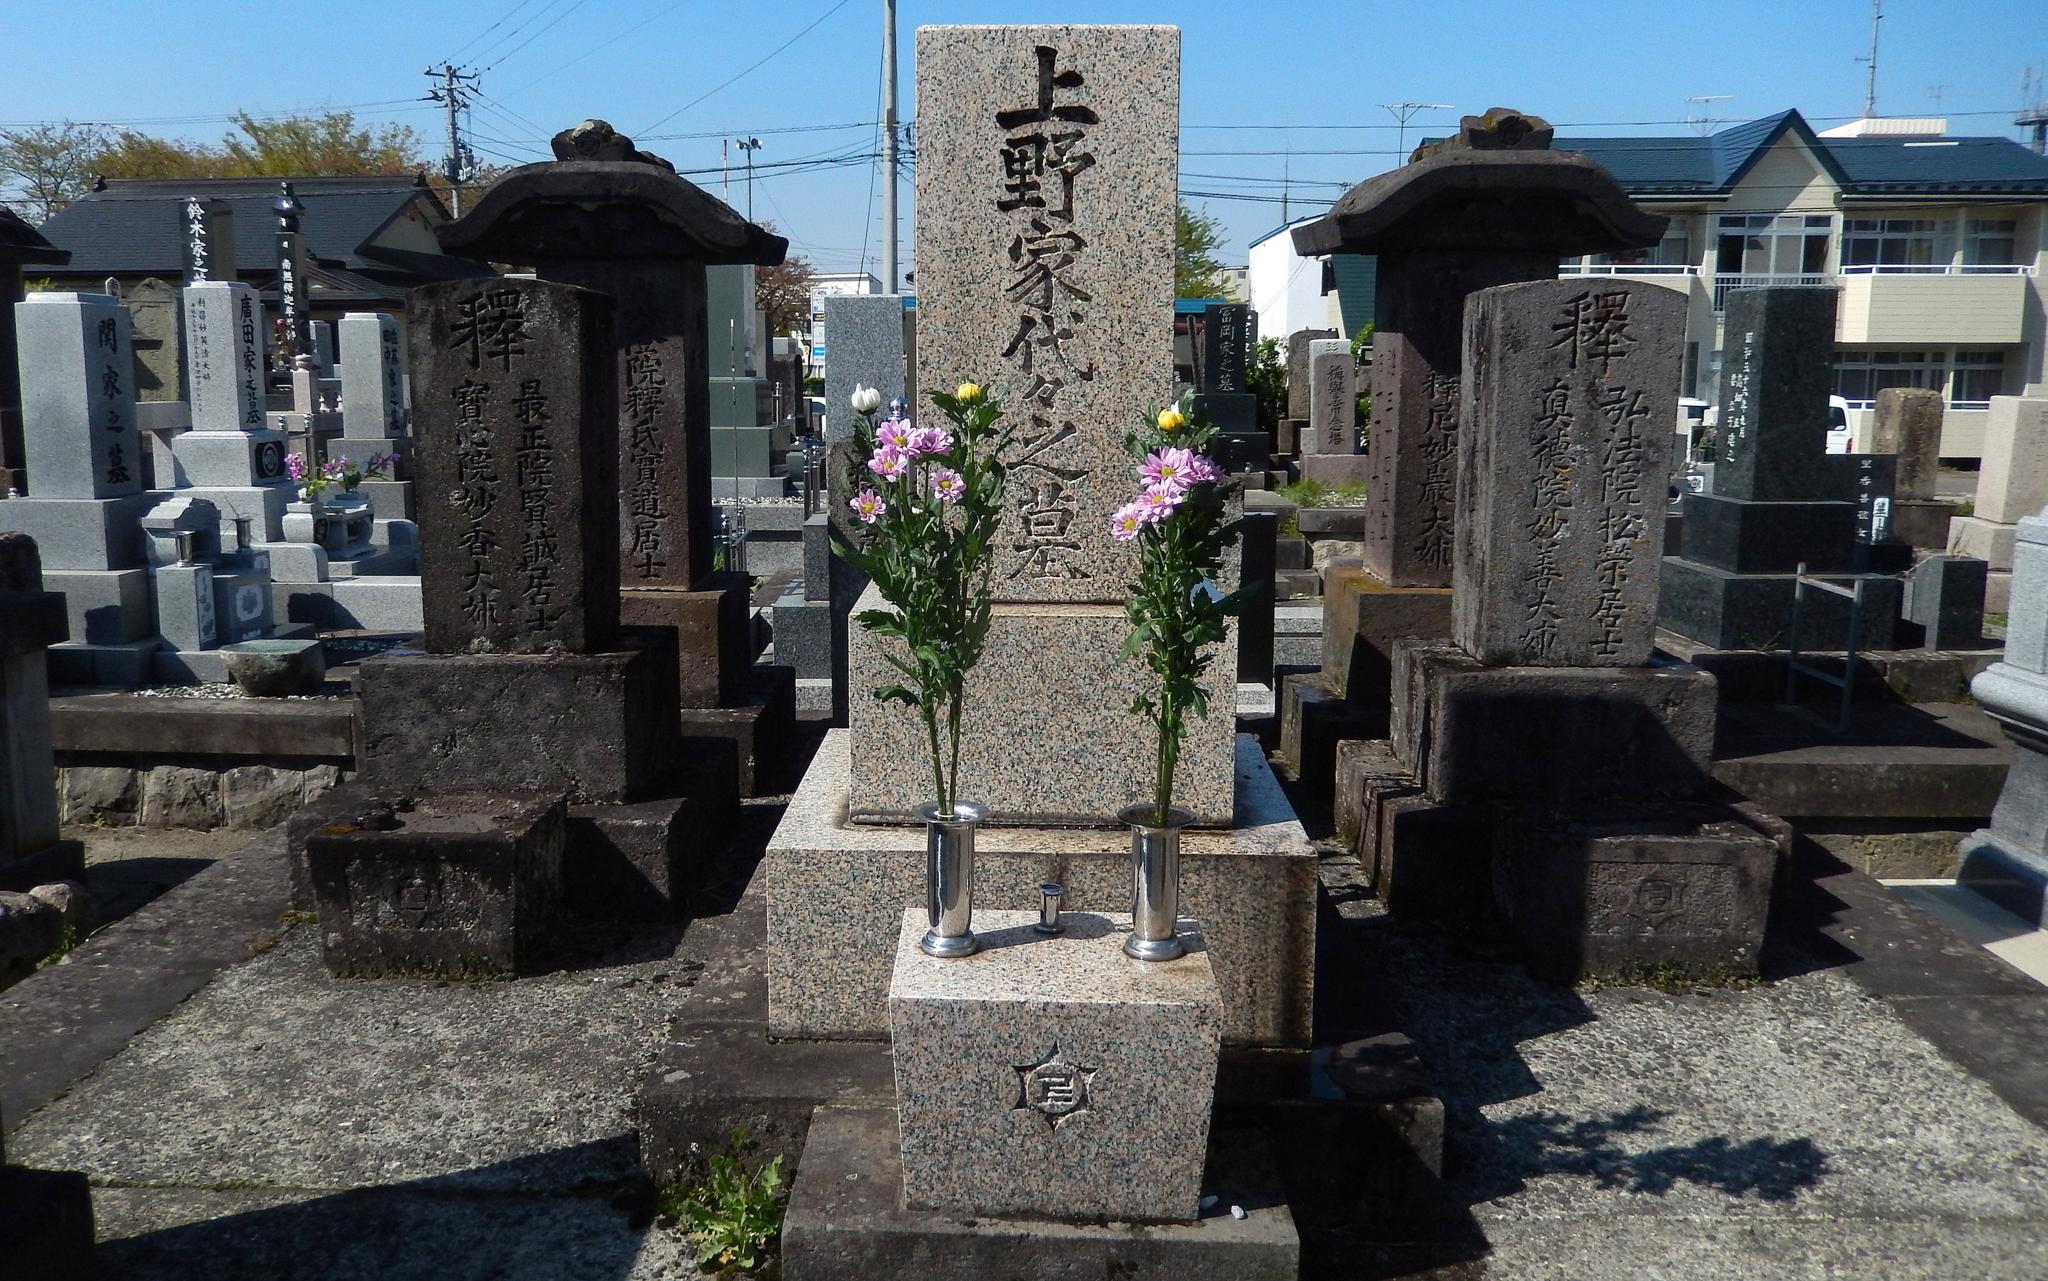 f:id:ToshUeno:20150426143537j:plain